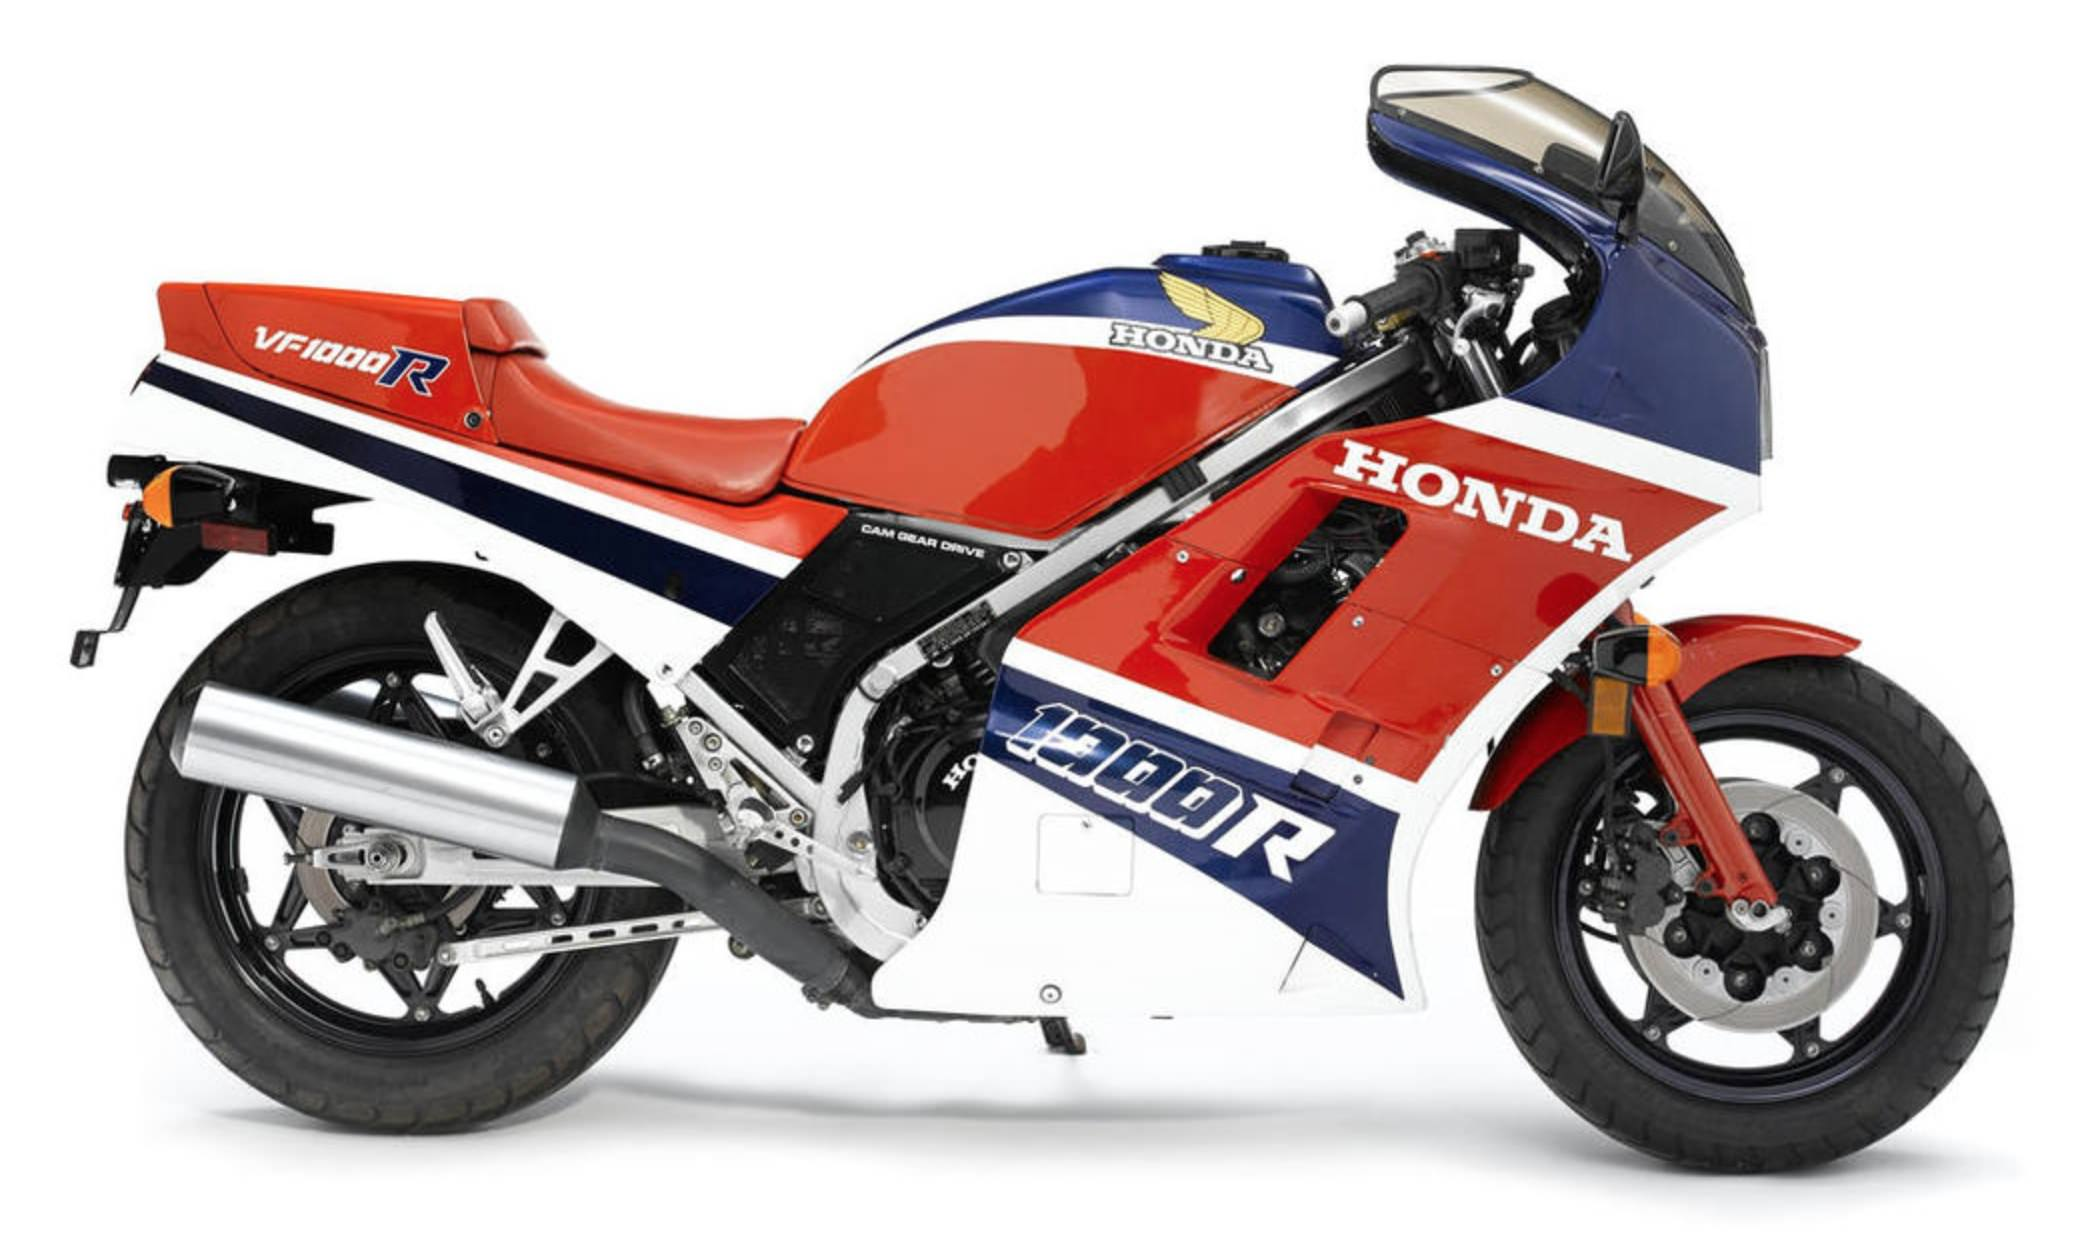 honda-vf1000r